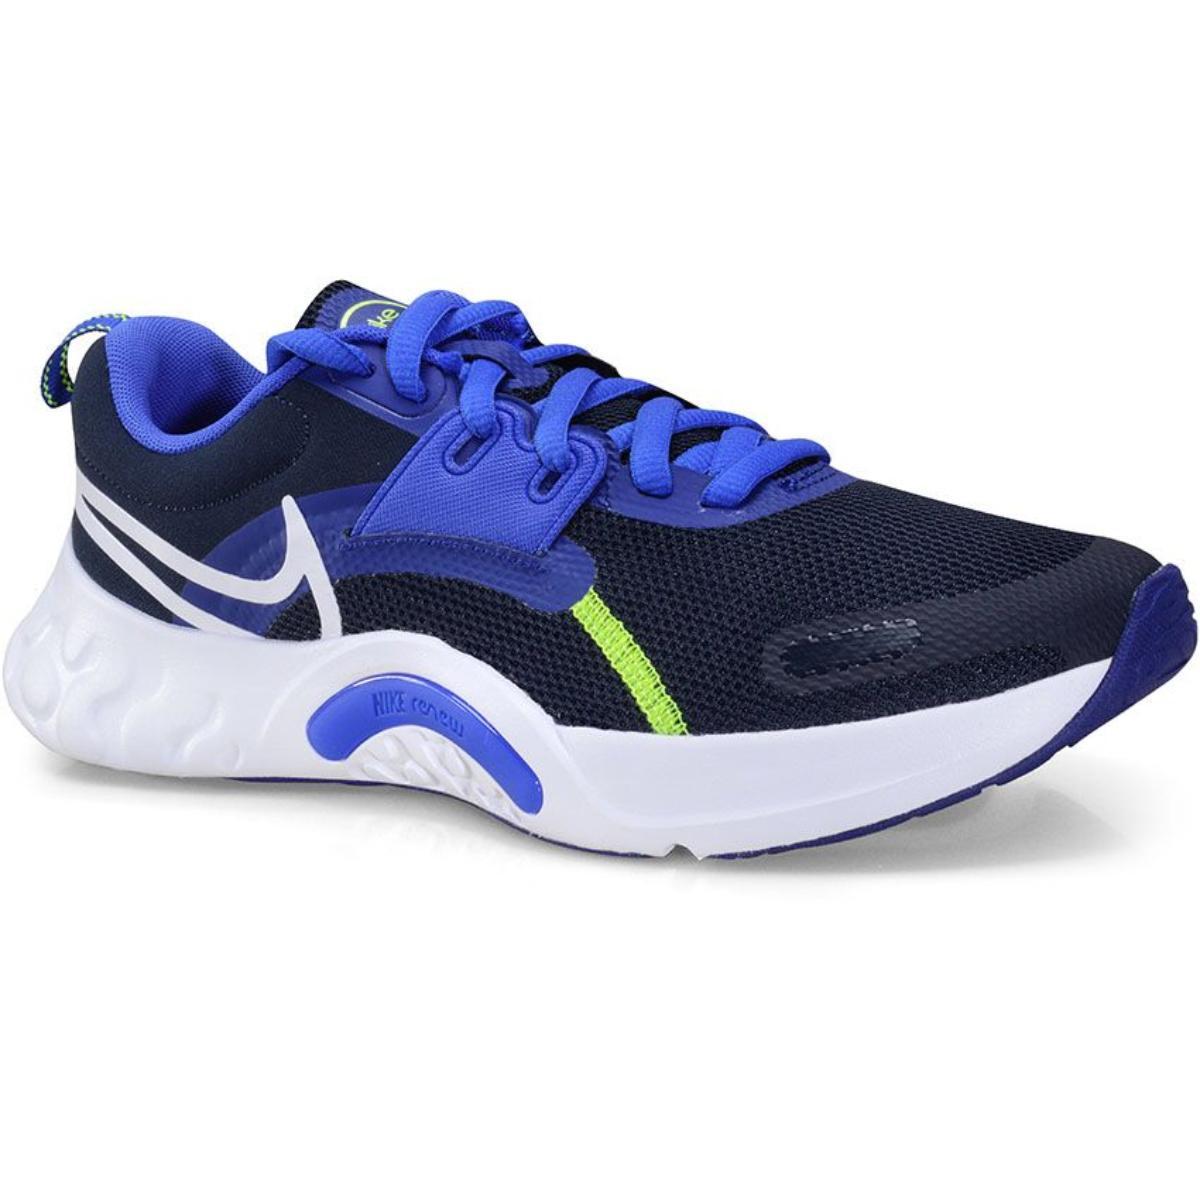 Tênis Masculino Nike Da1350-400 Renew Retaliation Preto/azul